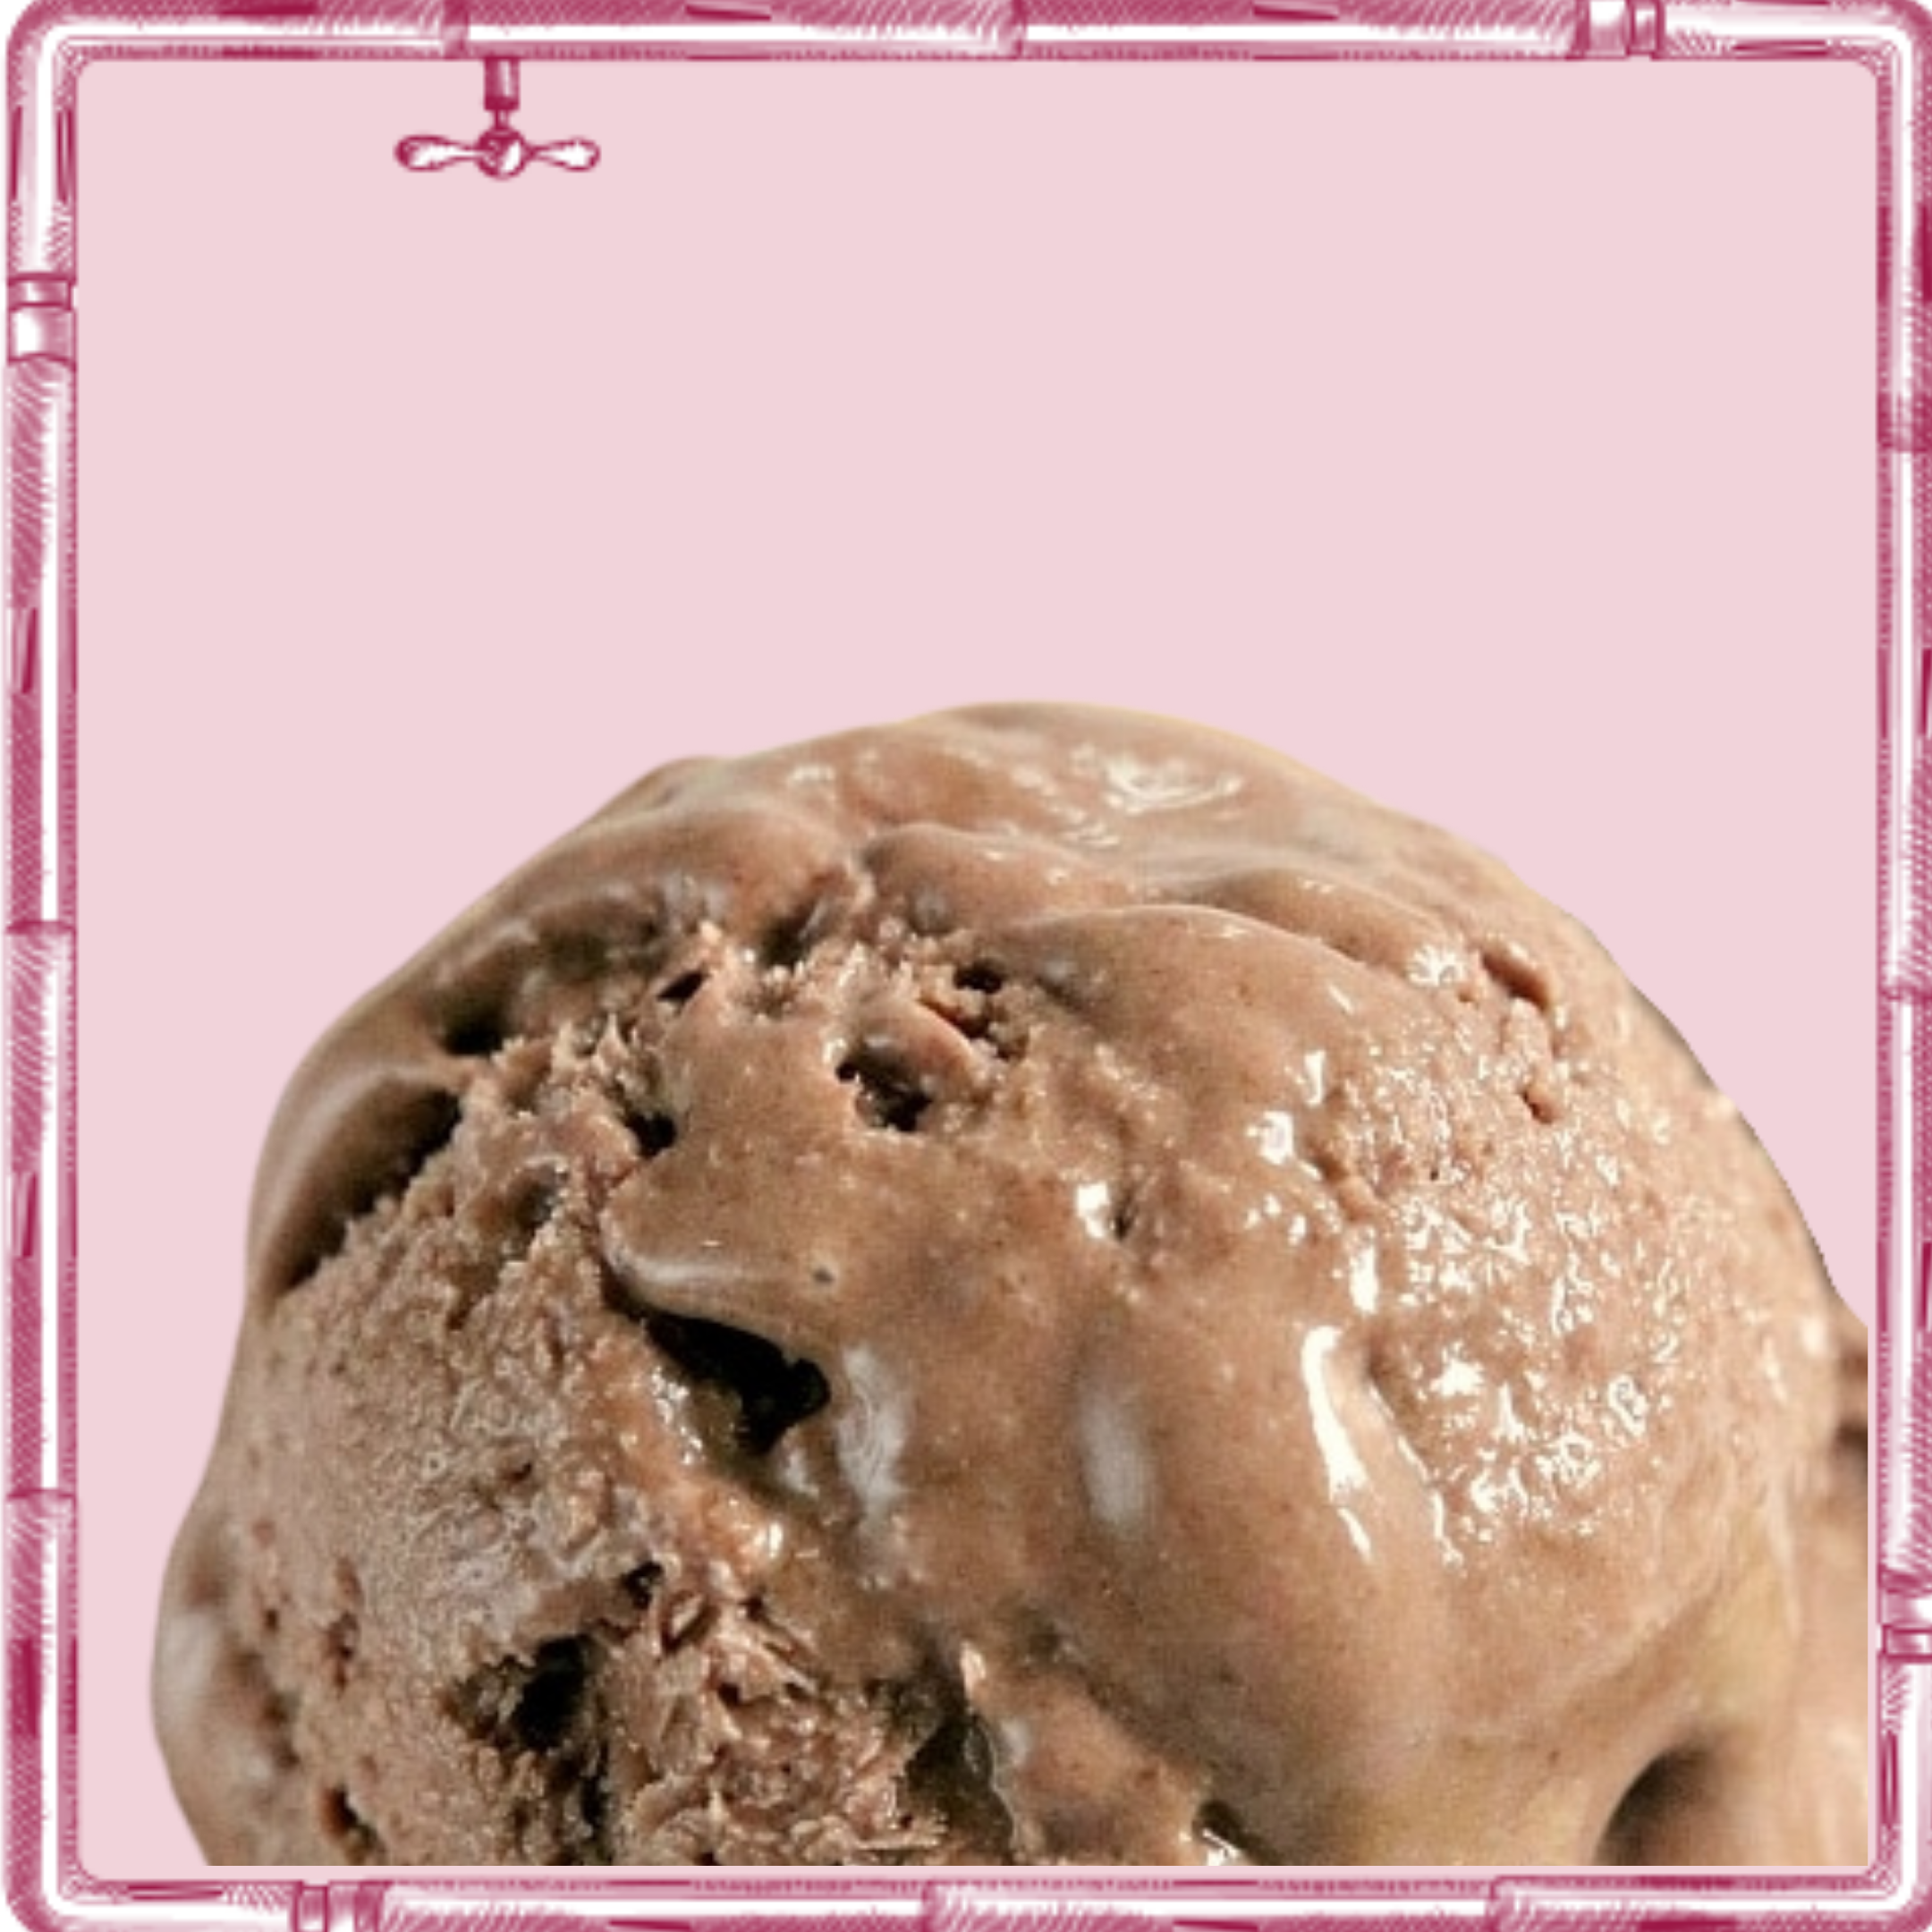 Chocolate Banana gelato (GF)